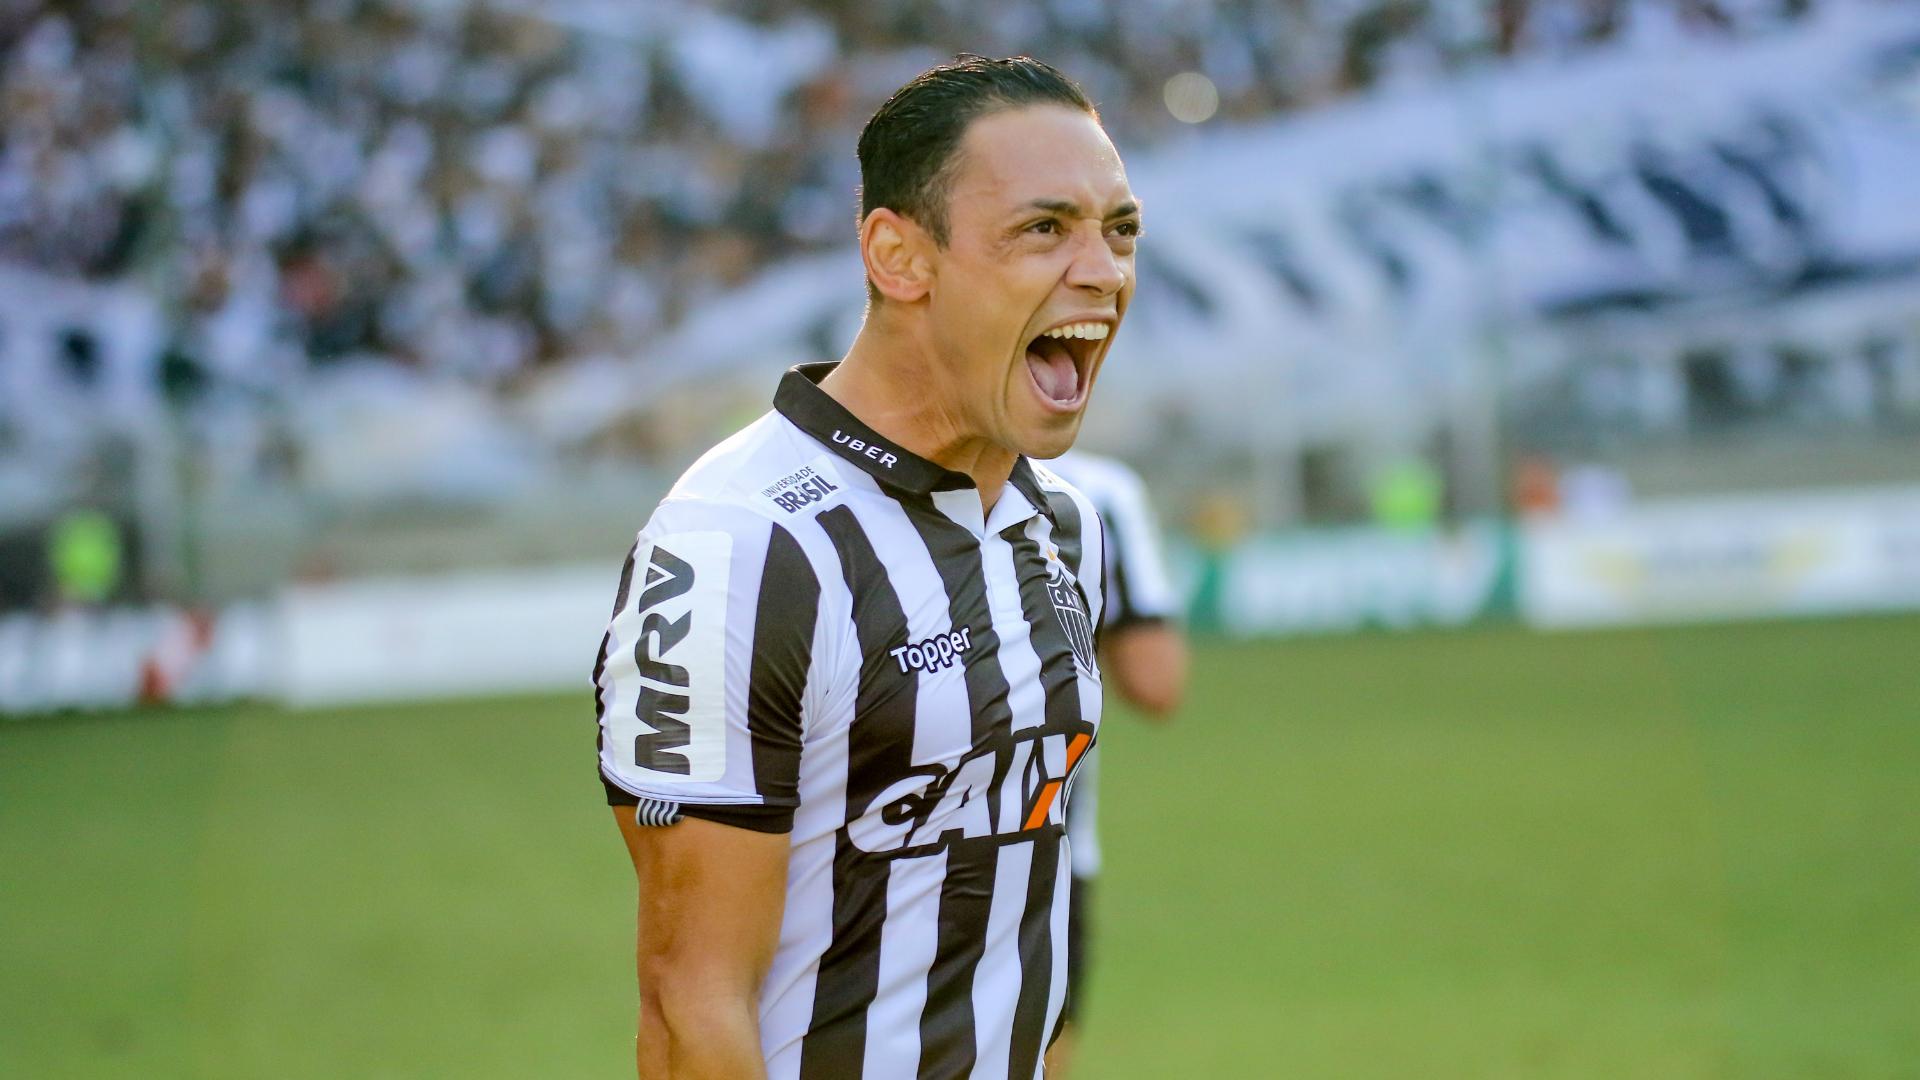 Ricardo Oliveira Atlético-MG Cruzeiro Campeonato Mineiro 01042018